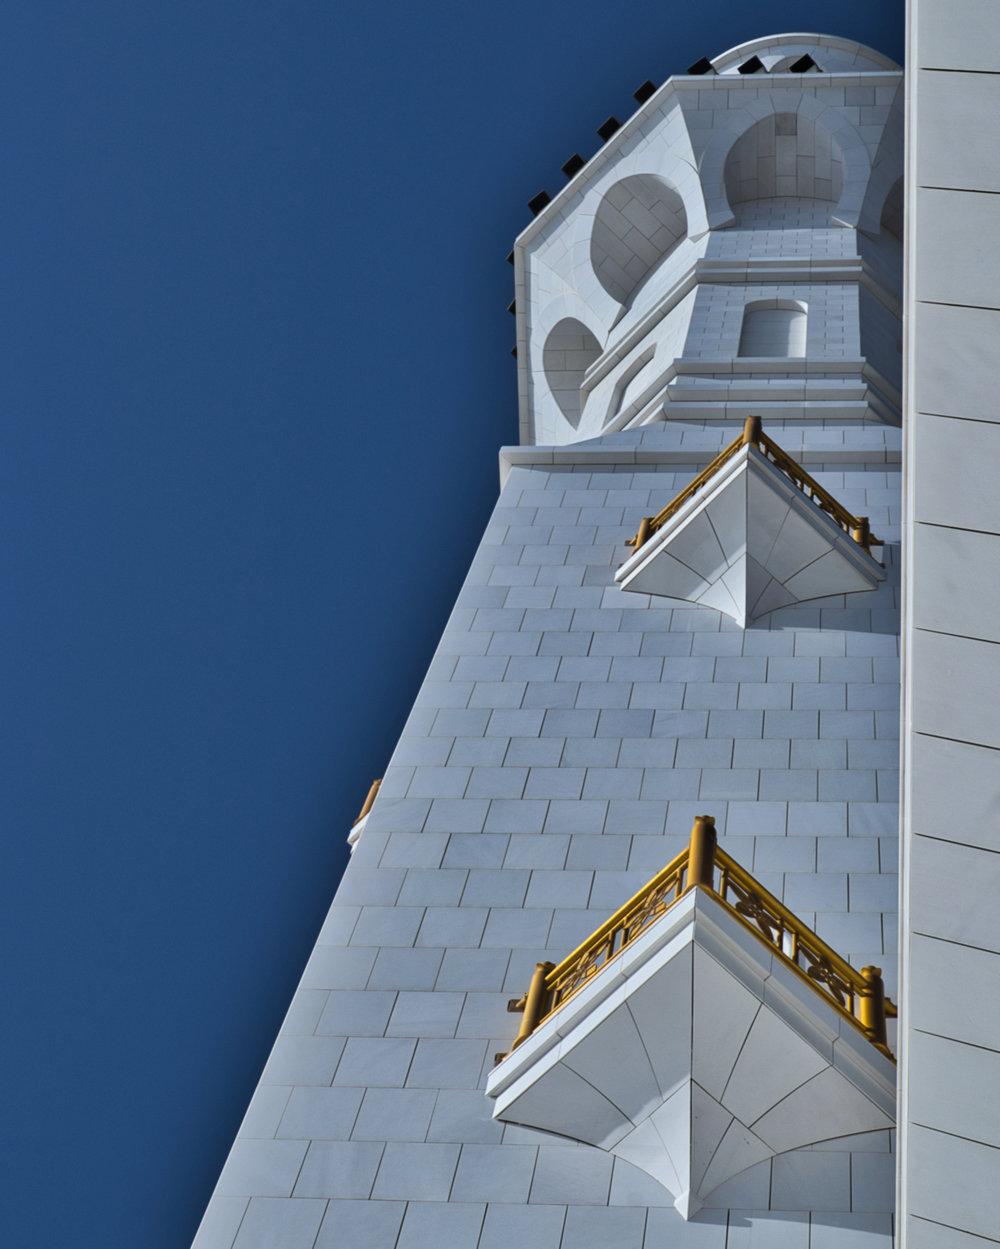 Moschea Abu Dhabi - minareto -1252.jpeg